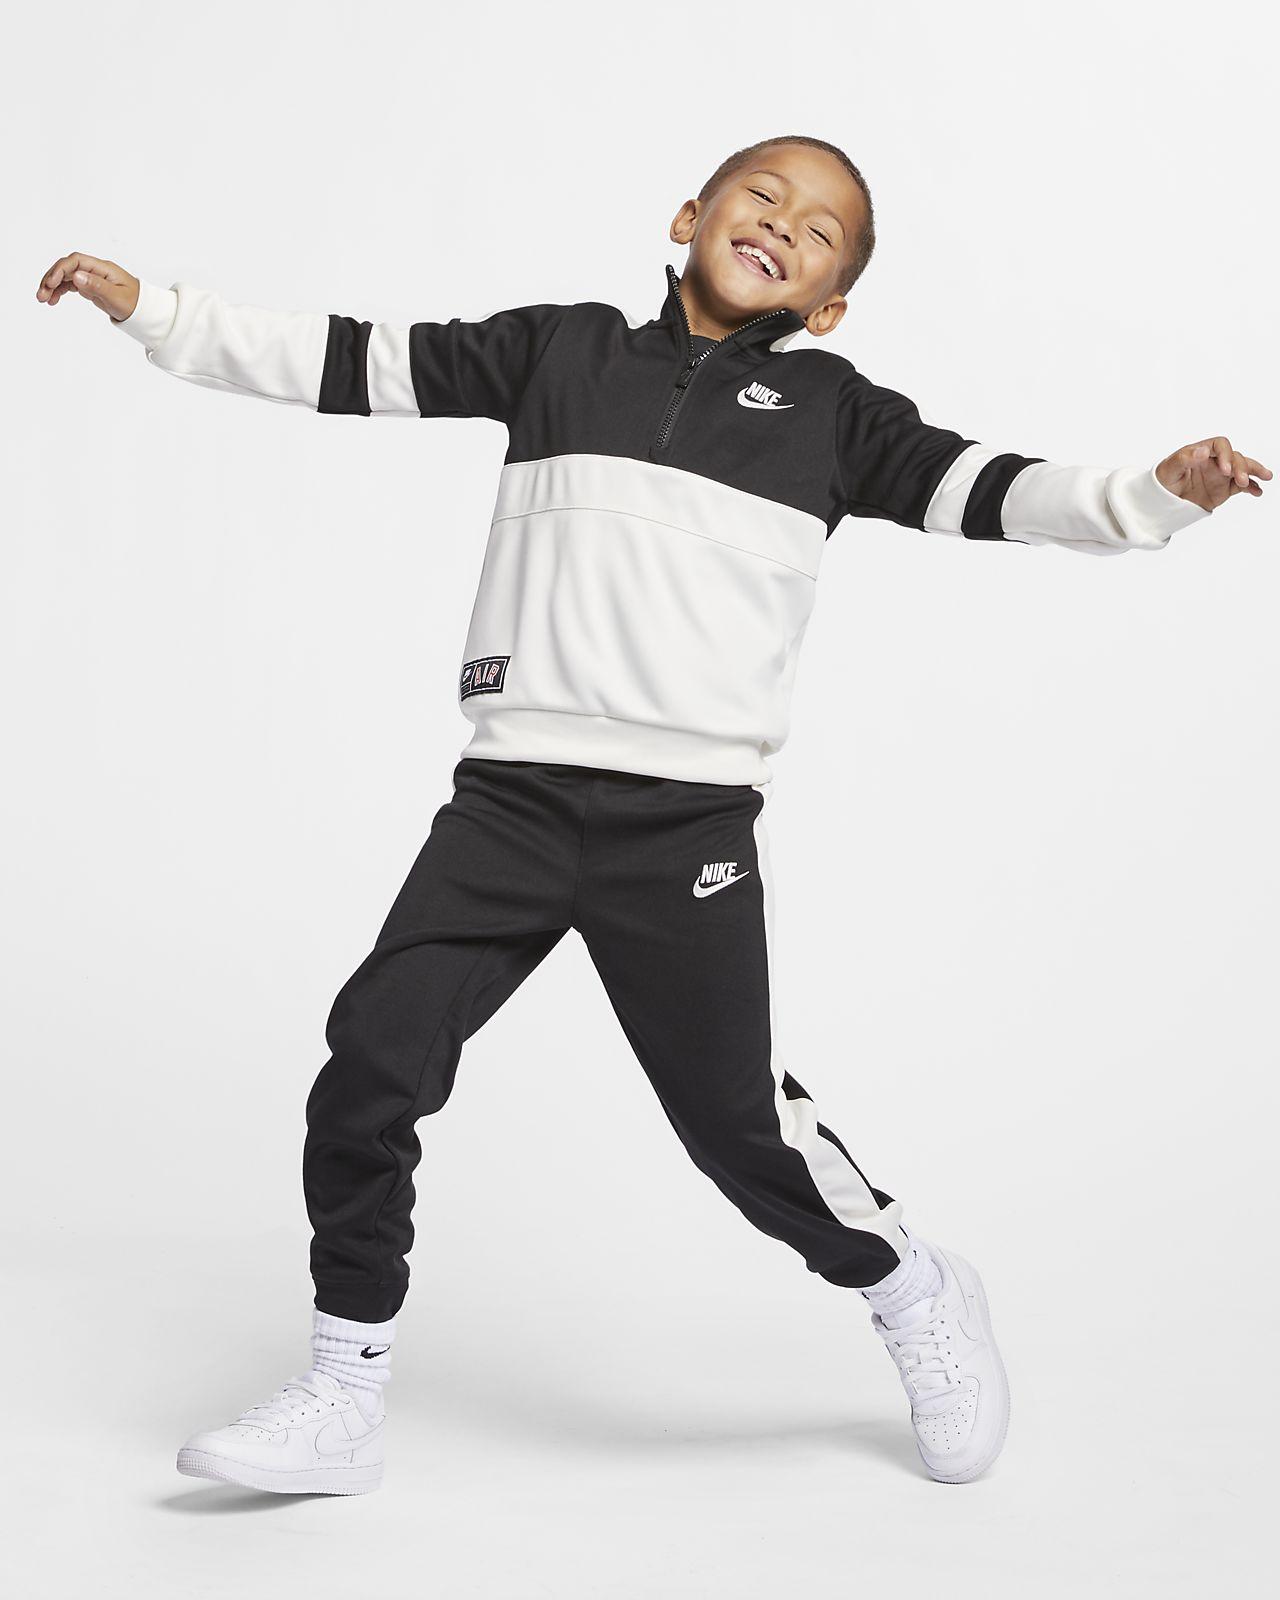 Nike Air Conjunto de dos piezas - Niño/a pequeño/a